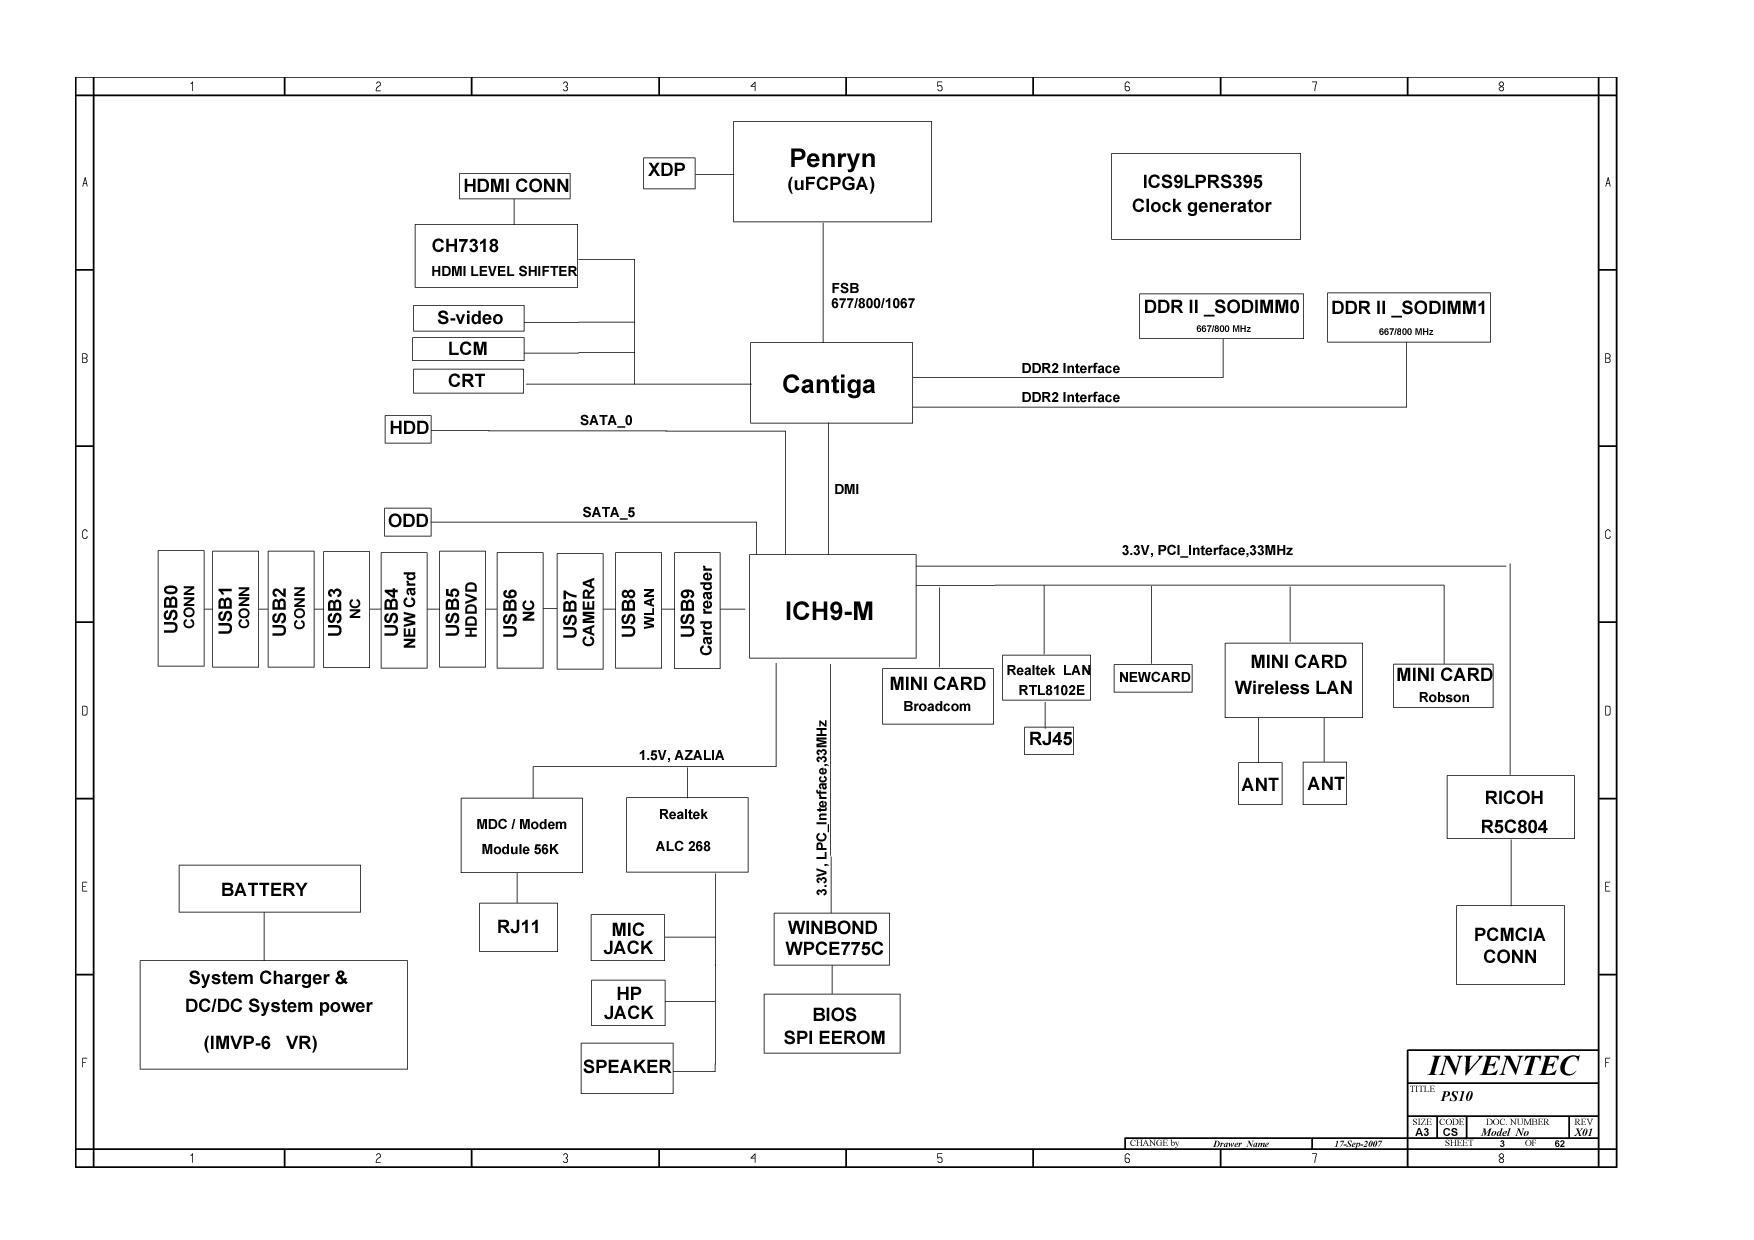 Schemat Toshiba Satellite L300 L305 Inventec Ps10 Ps10s